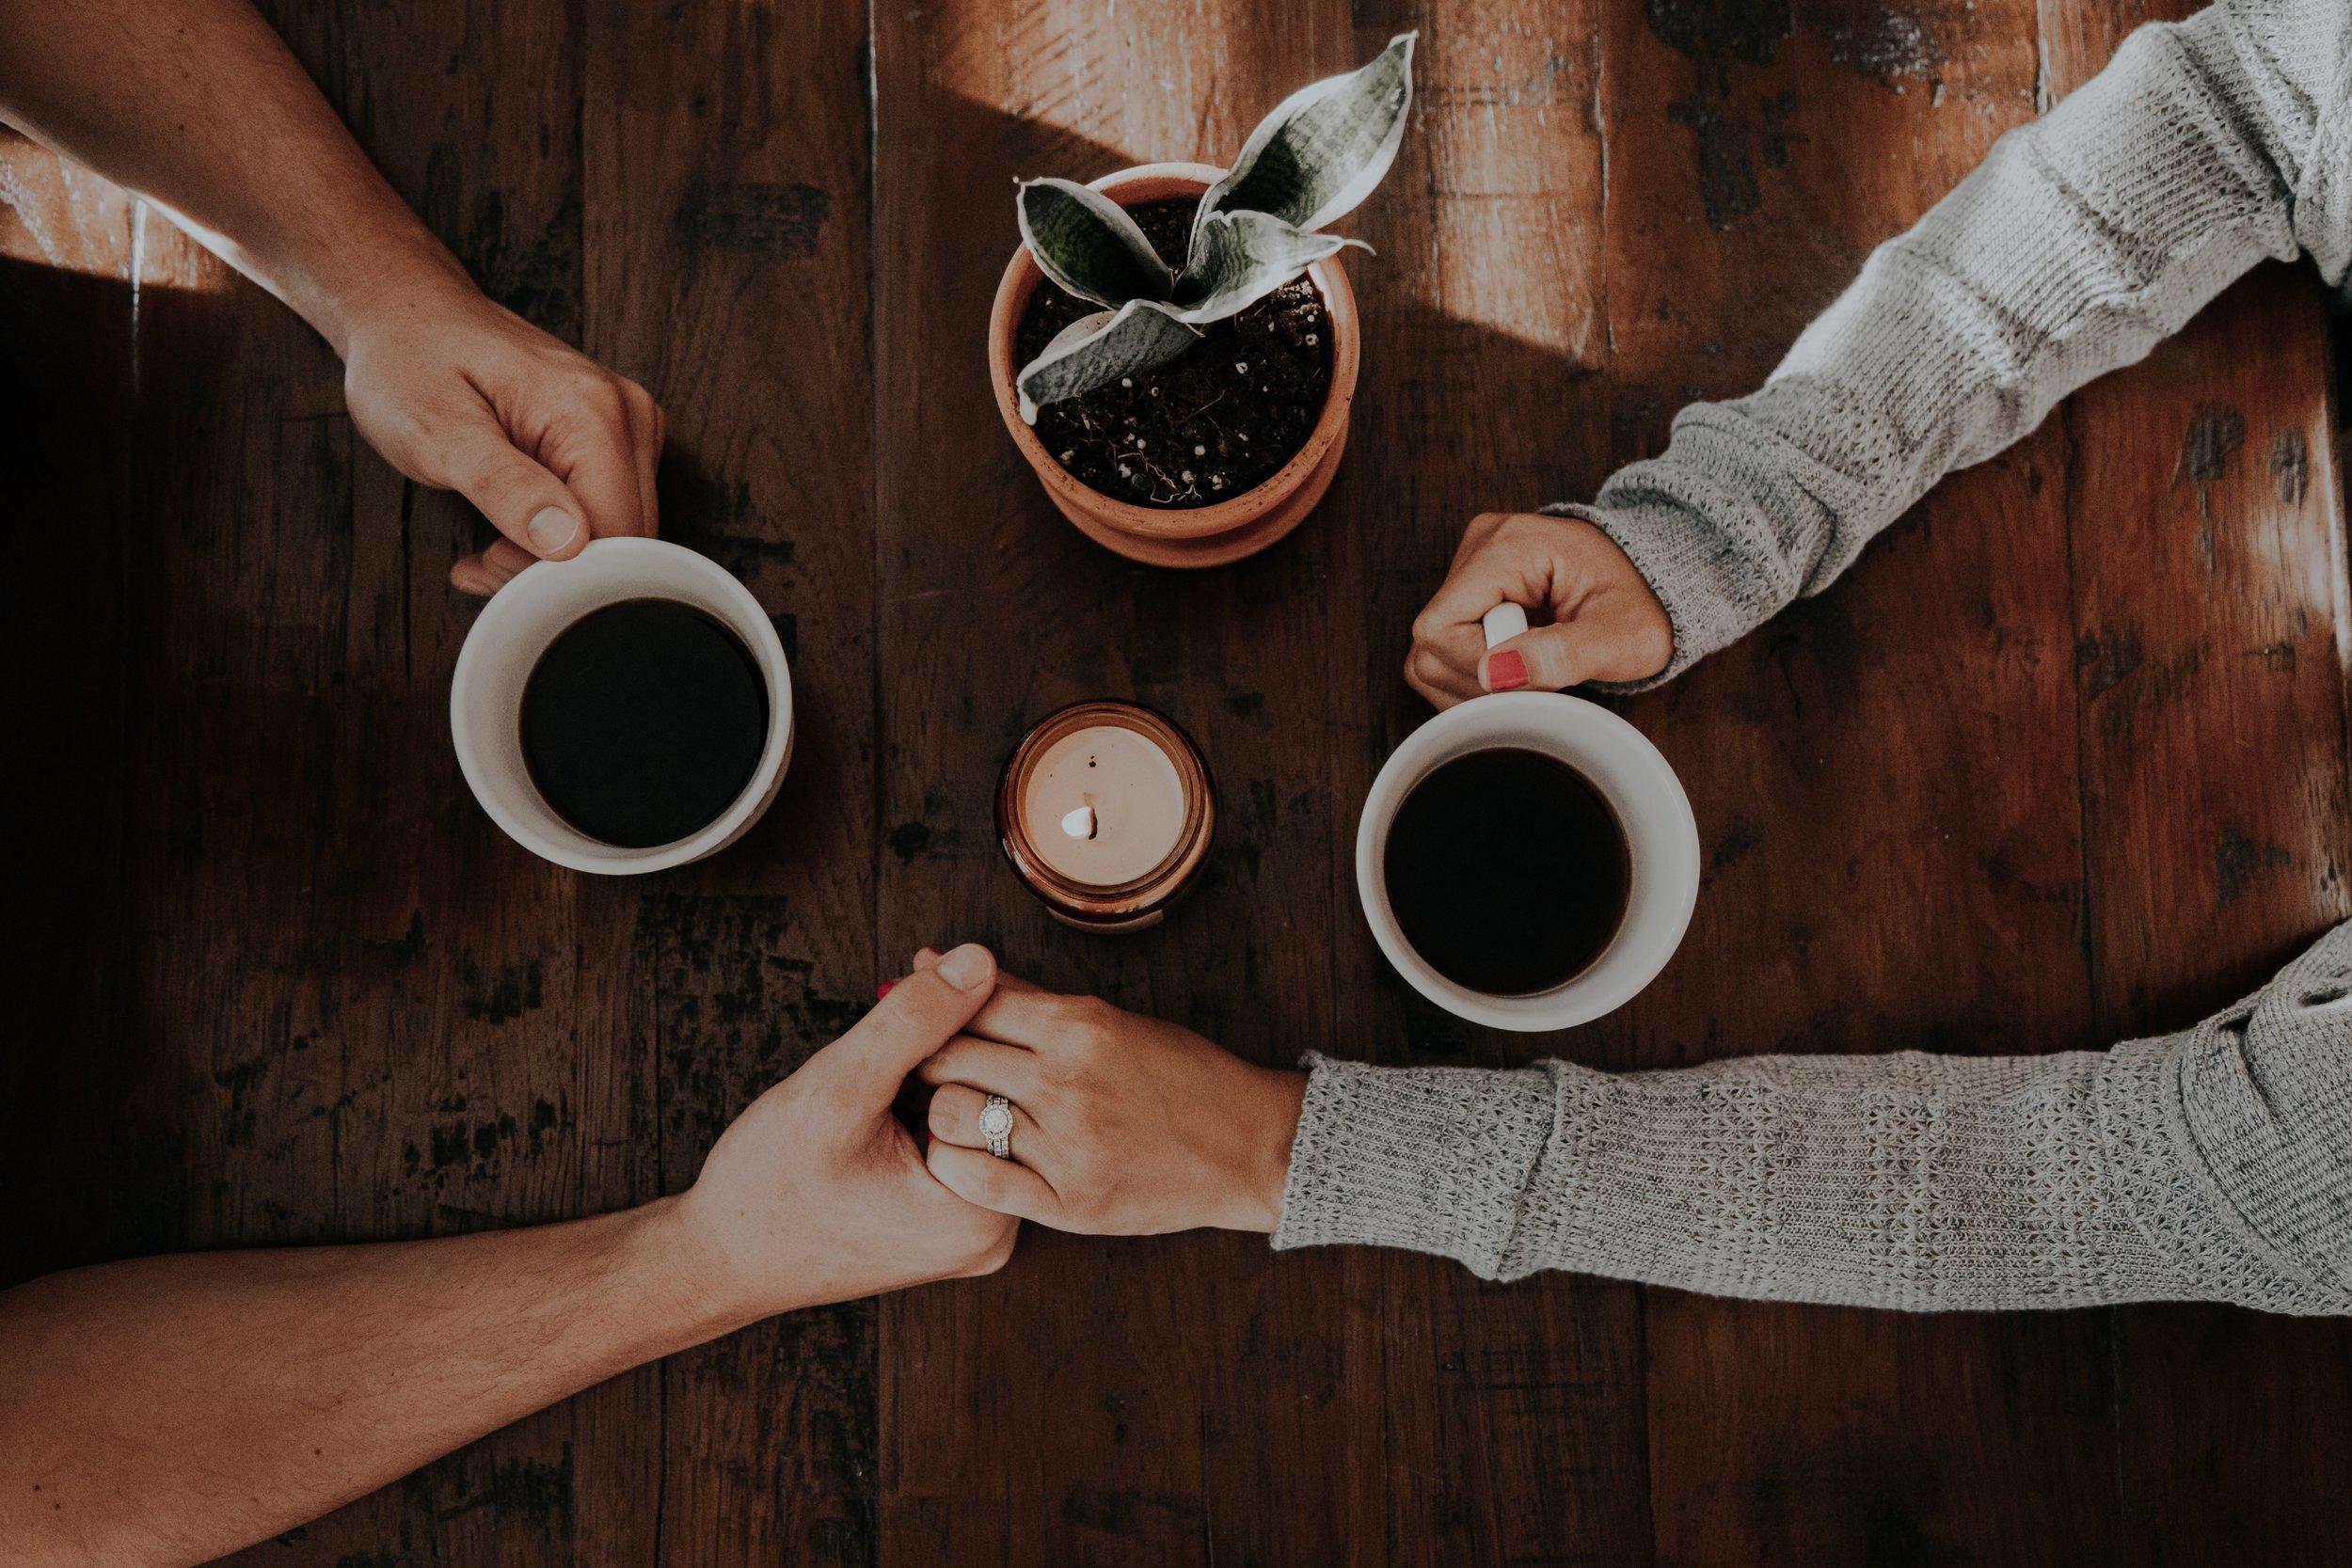 Financial coaching for couples